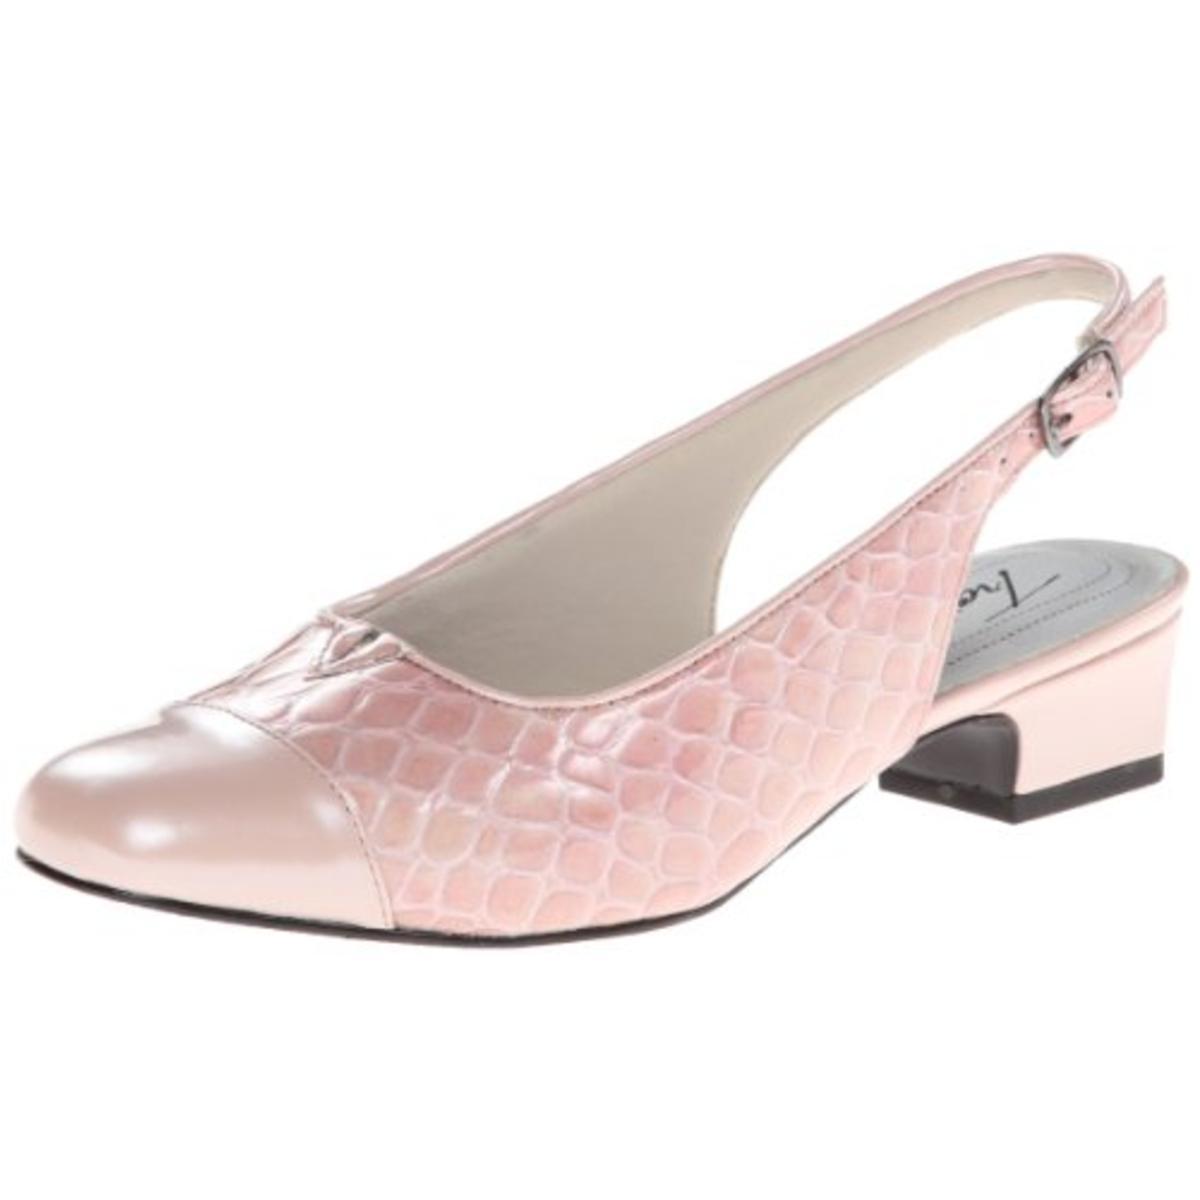 Trotters Dress Shoes